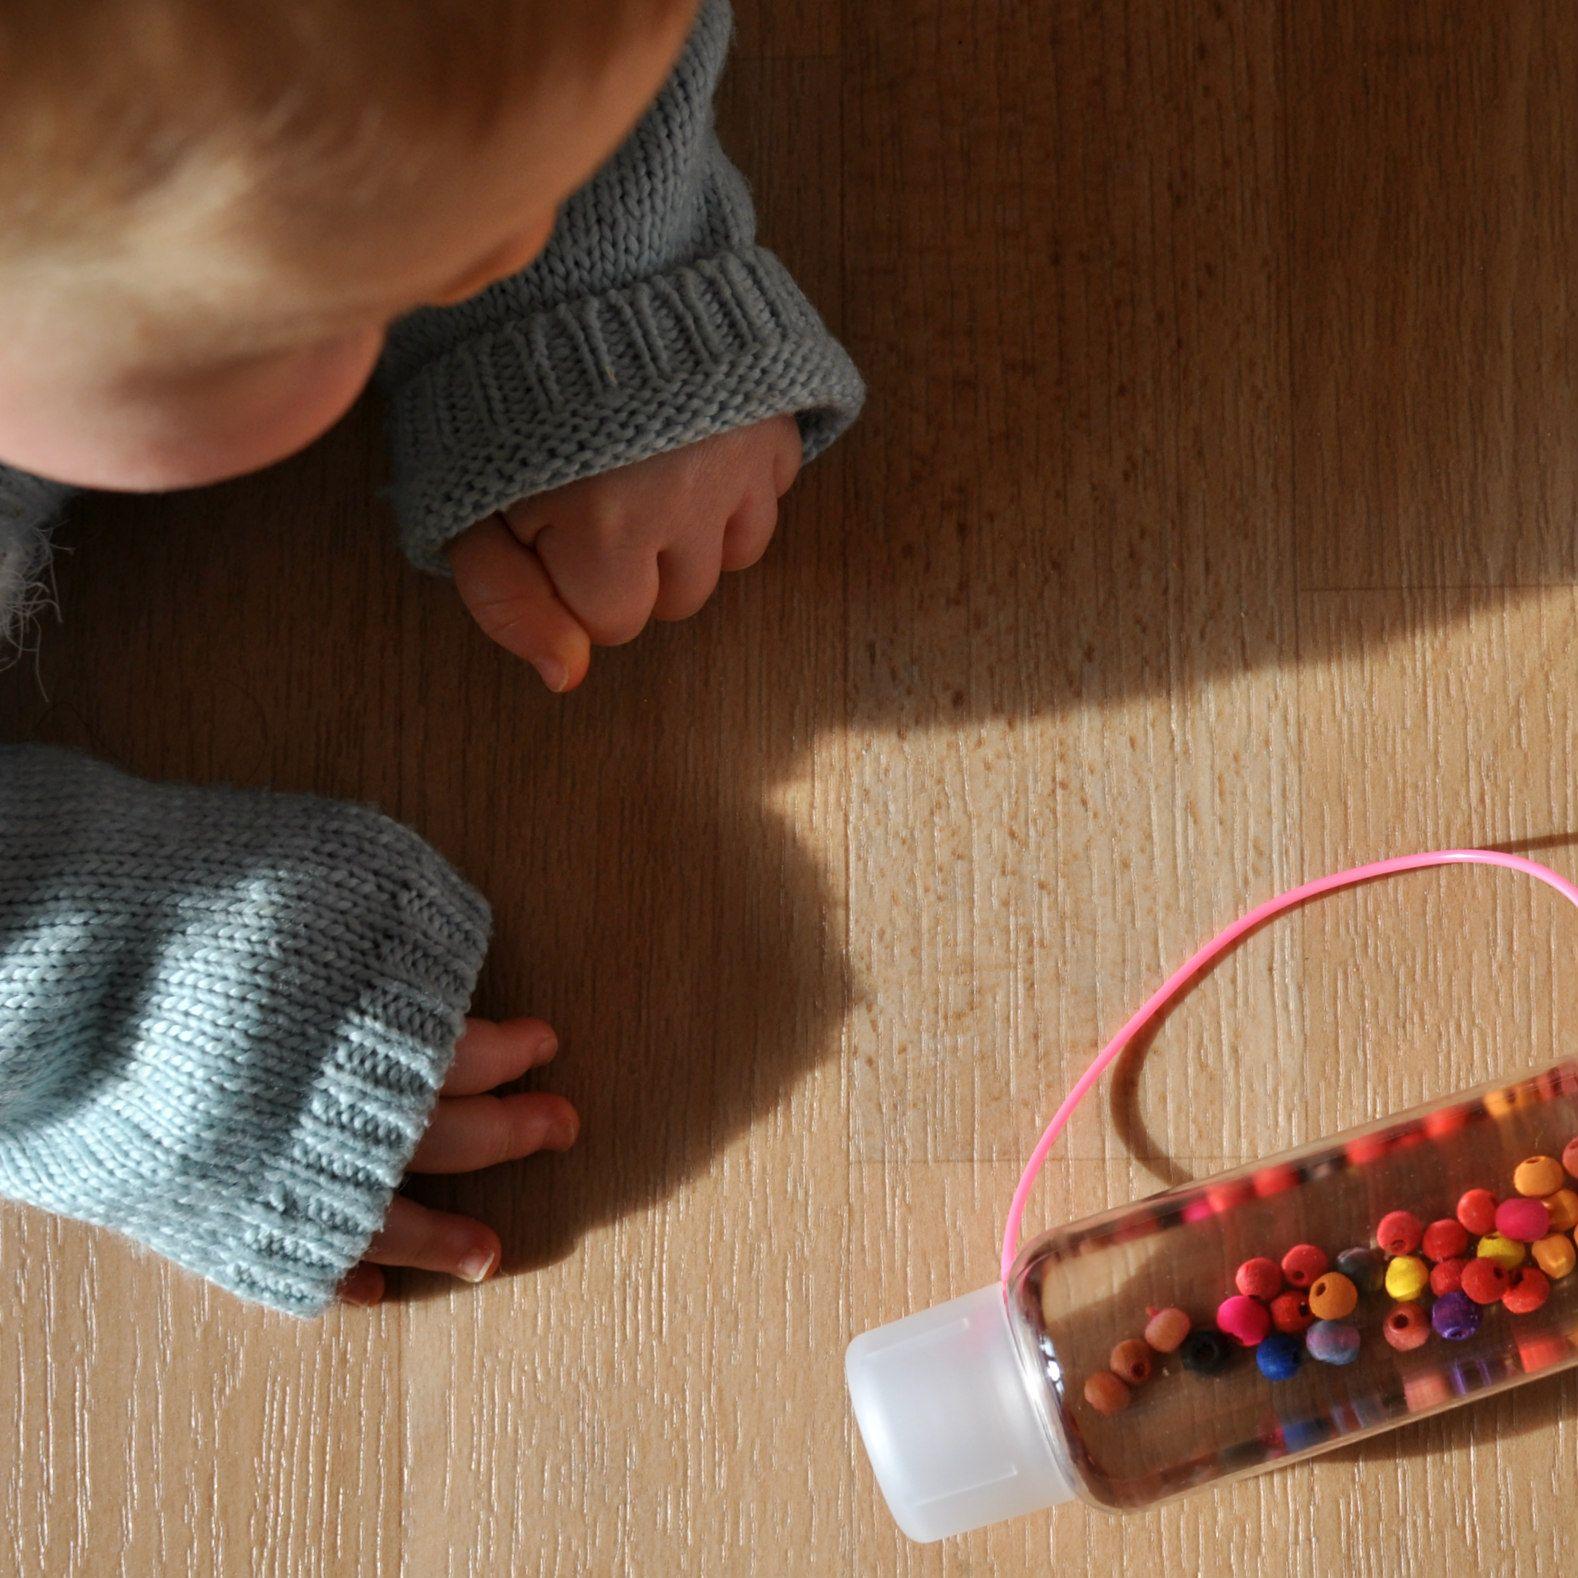 luxus babyspielzeug selbst basteln tierspielzeug. Black Bedroom Furniture Sets. Home Design Ideas